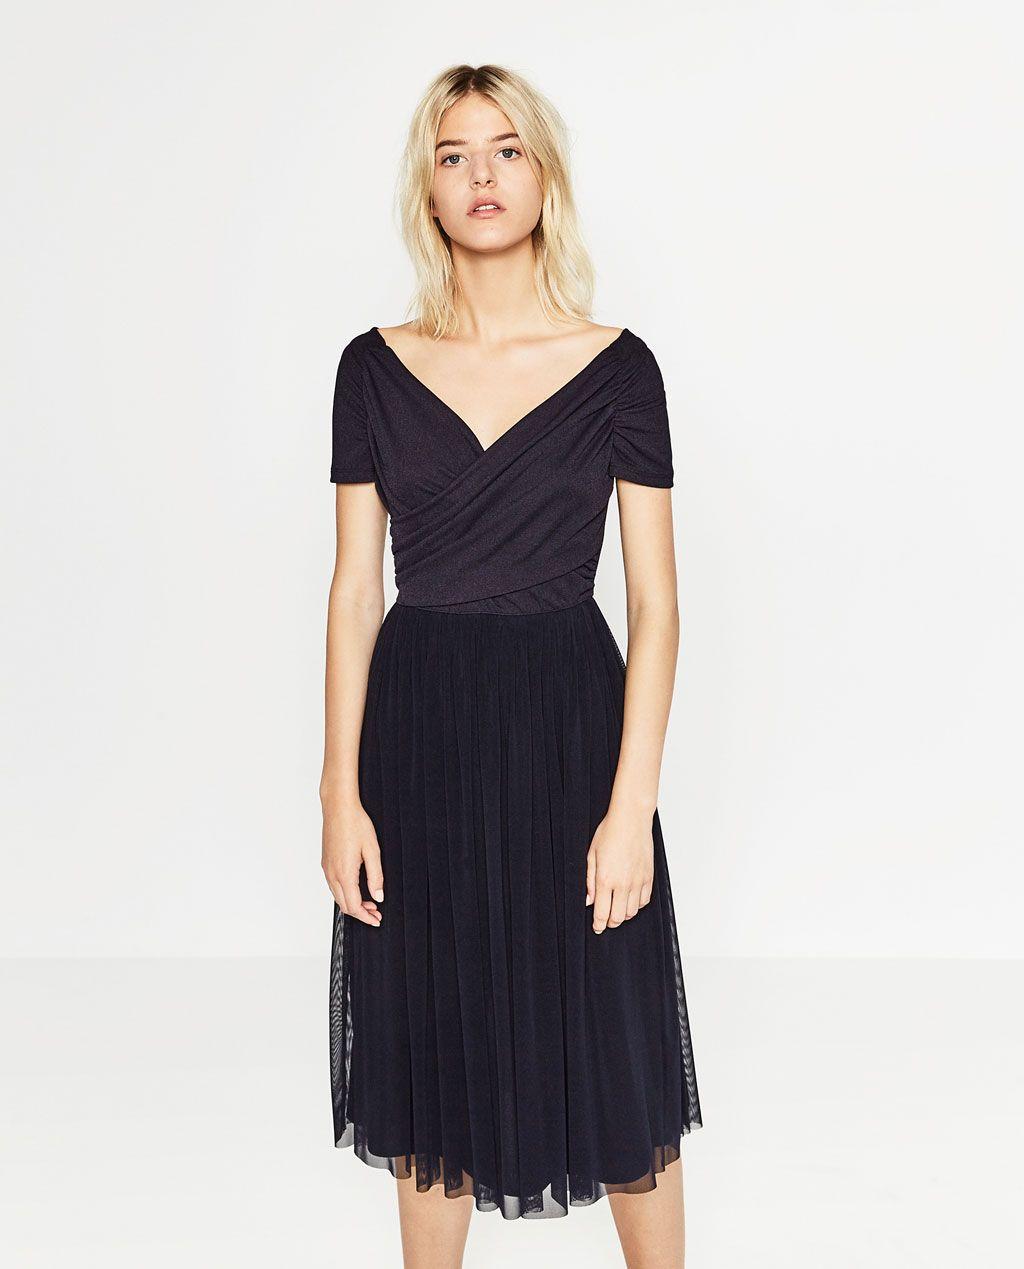 BALLERINA DRESS-DRESSES-WOMAN-COLLECTION AW16 | ZARA United States $49.99 - BALLERINA DRESS-DRESSES-WOMAN-COLLECTION AW16 ZARA United States